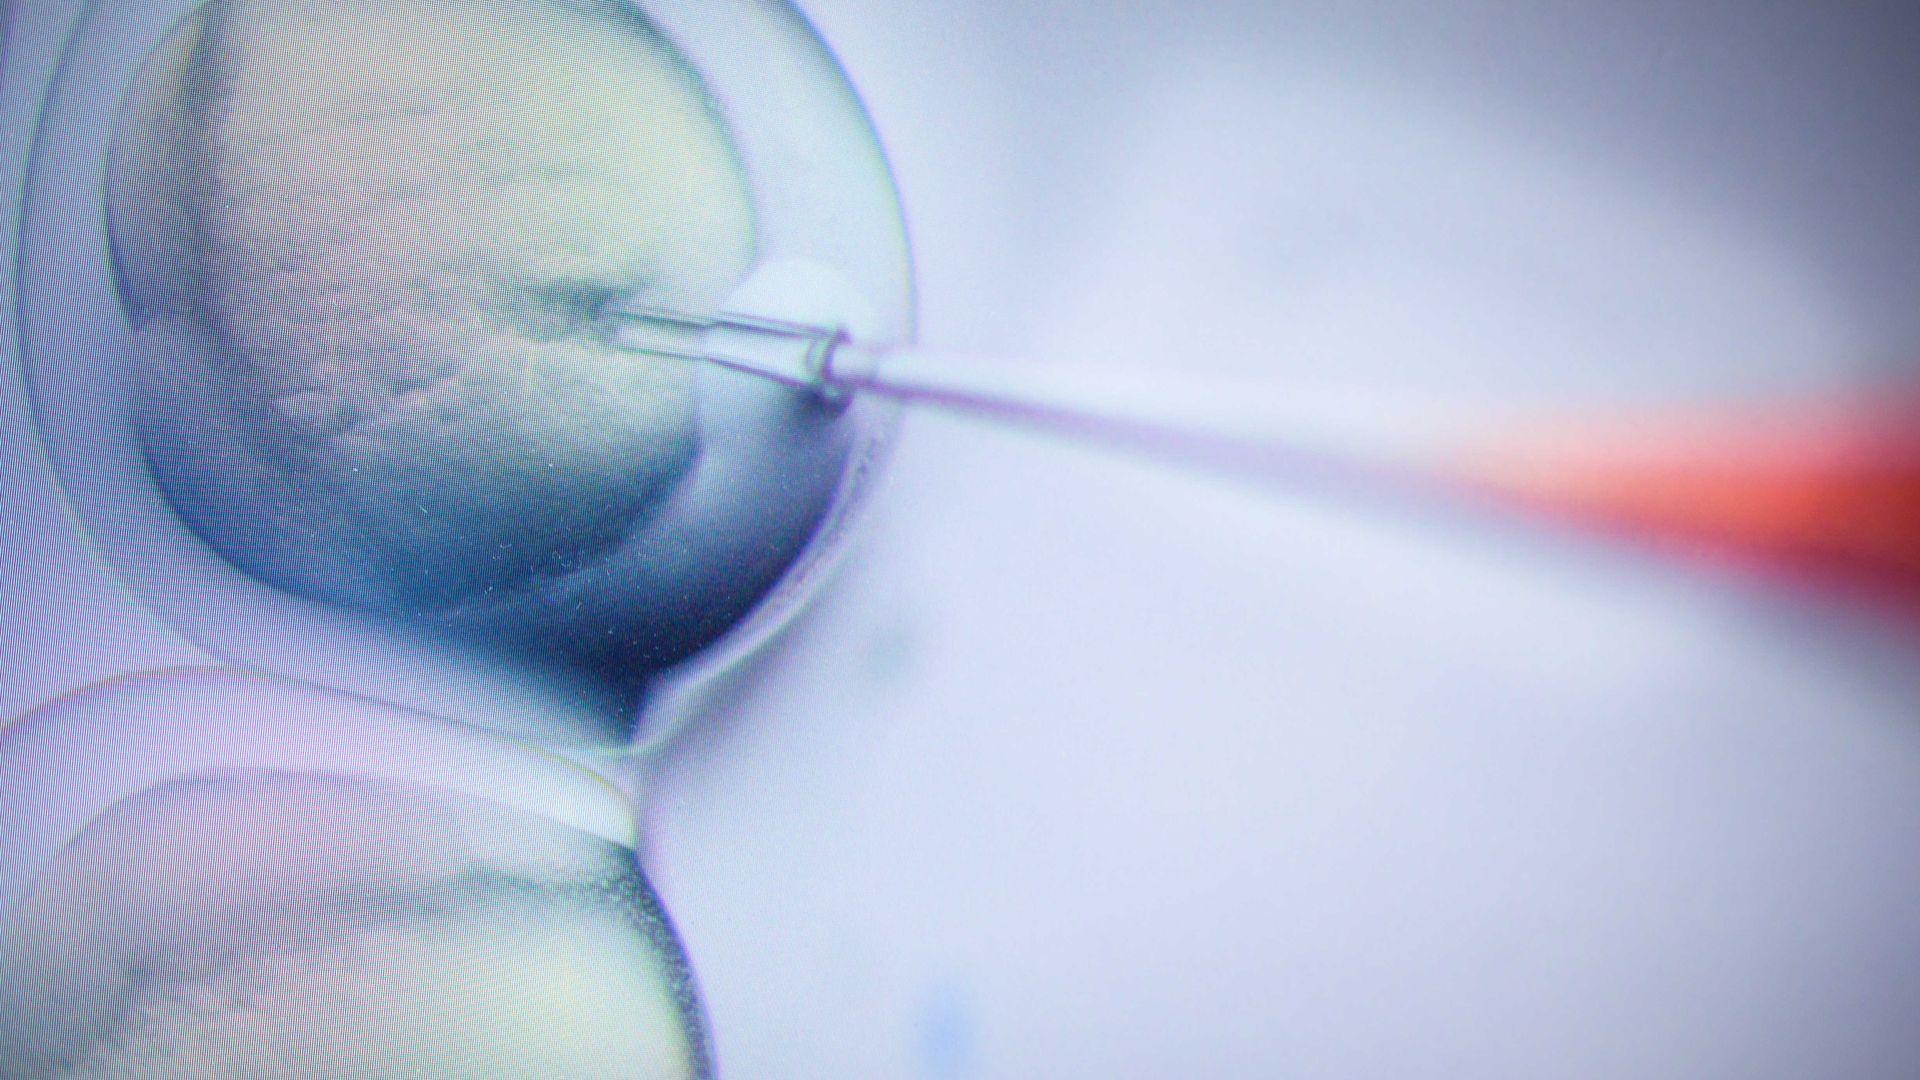 CRISPR technology is used to modify genes